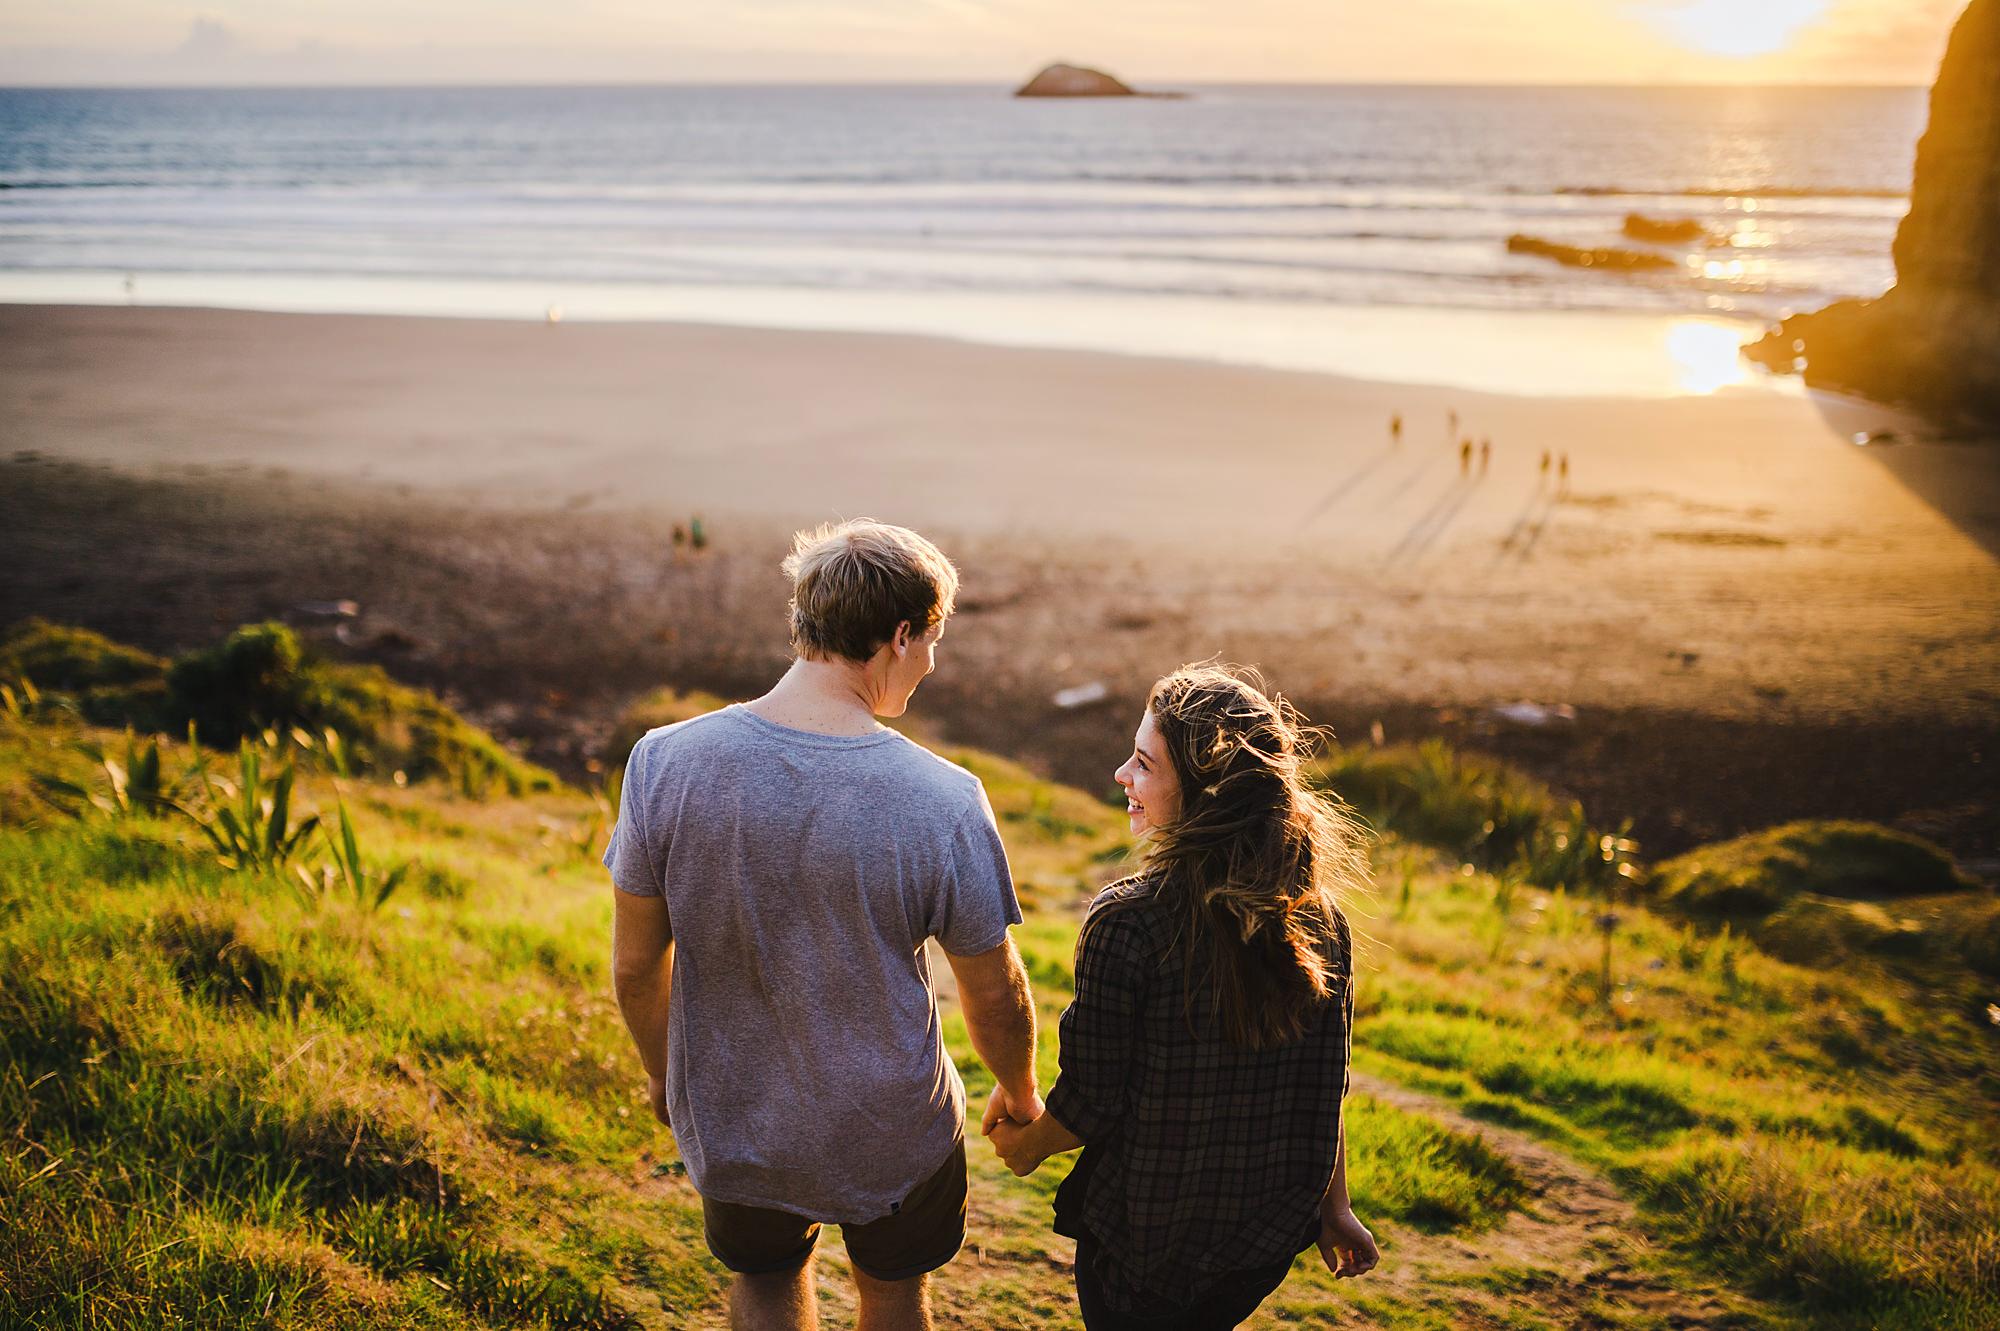 11 couple walking into sunset on beach muriwai.jpg